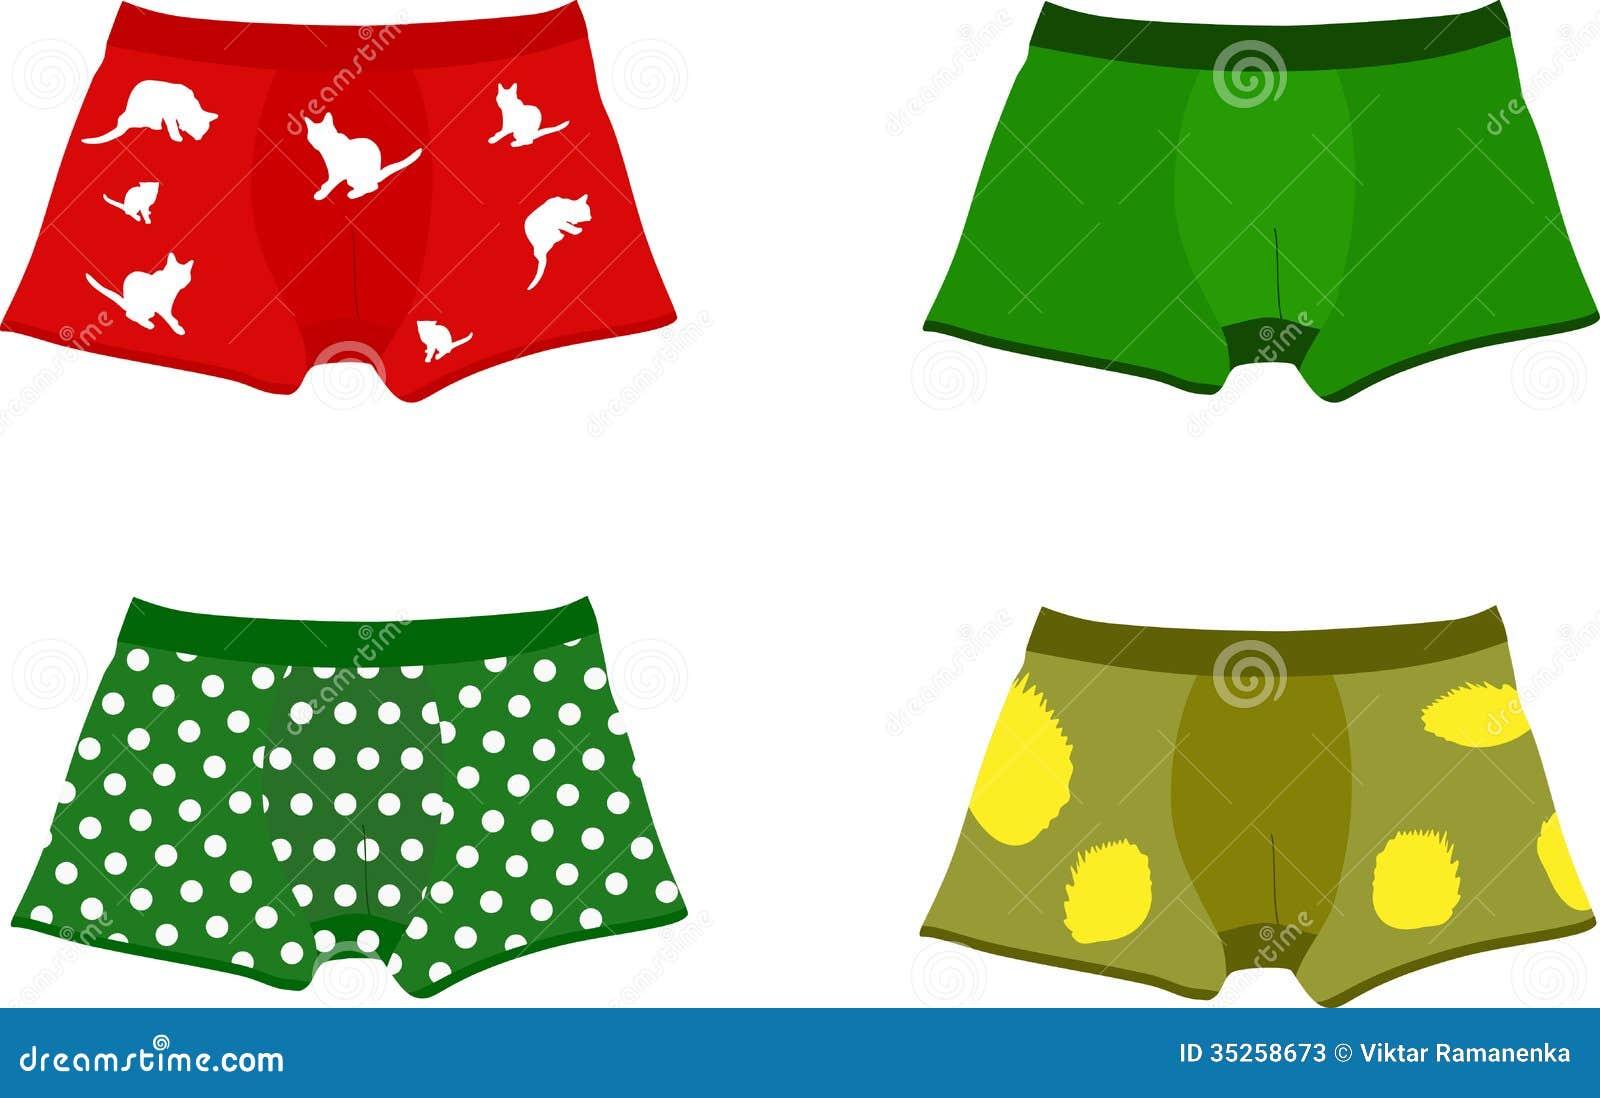 Set of men's underpants stock vector. Illustration of ...